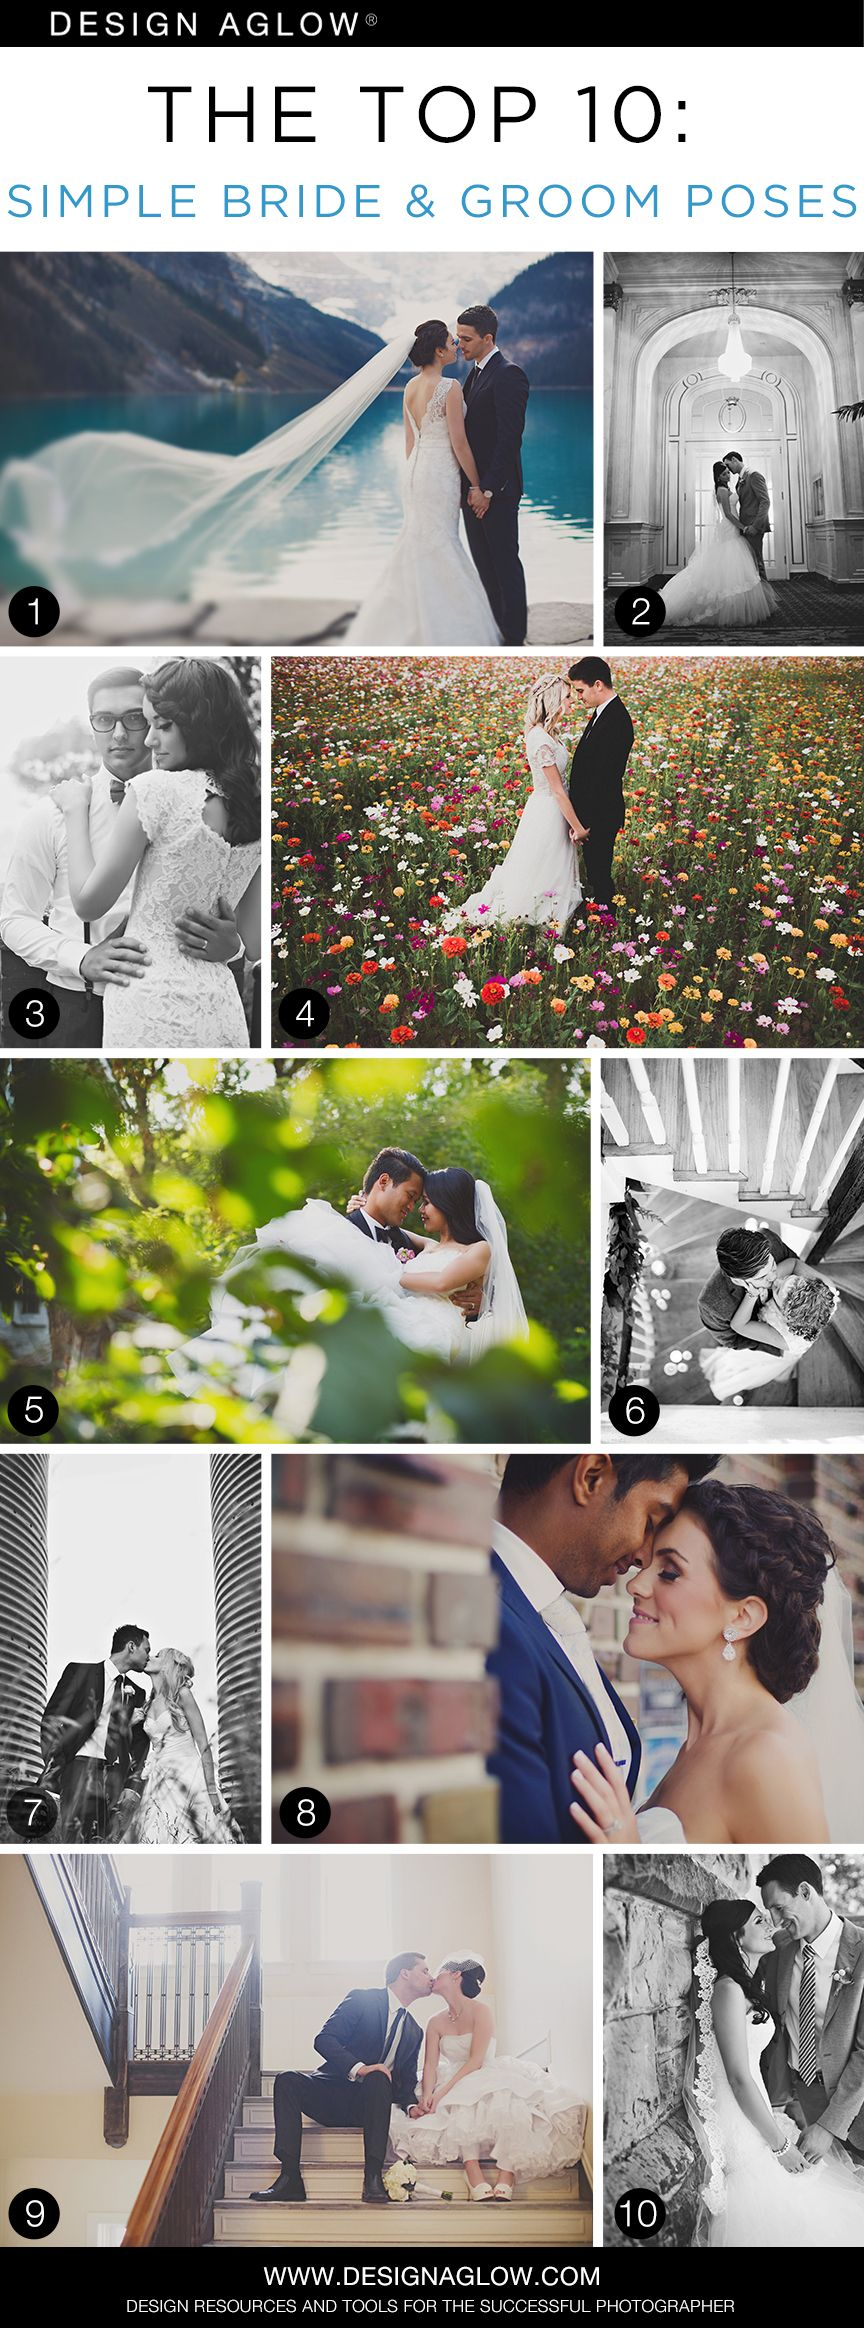 The Top 10: Simple Bride & Groom Poses